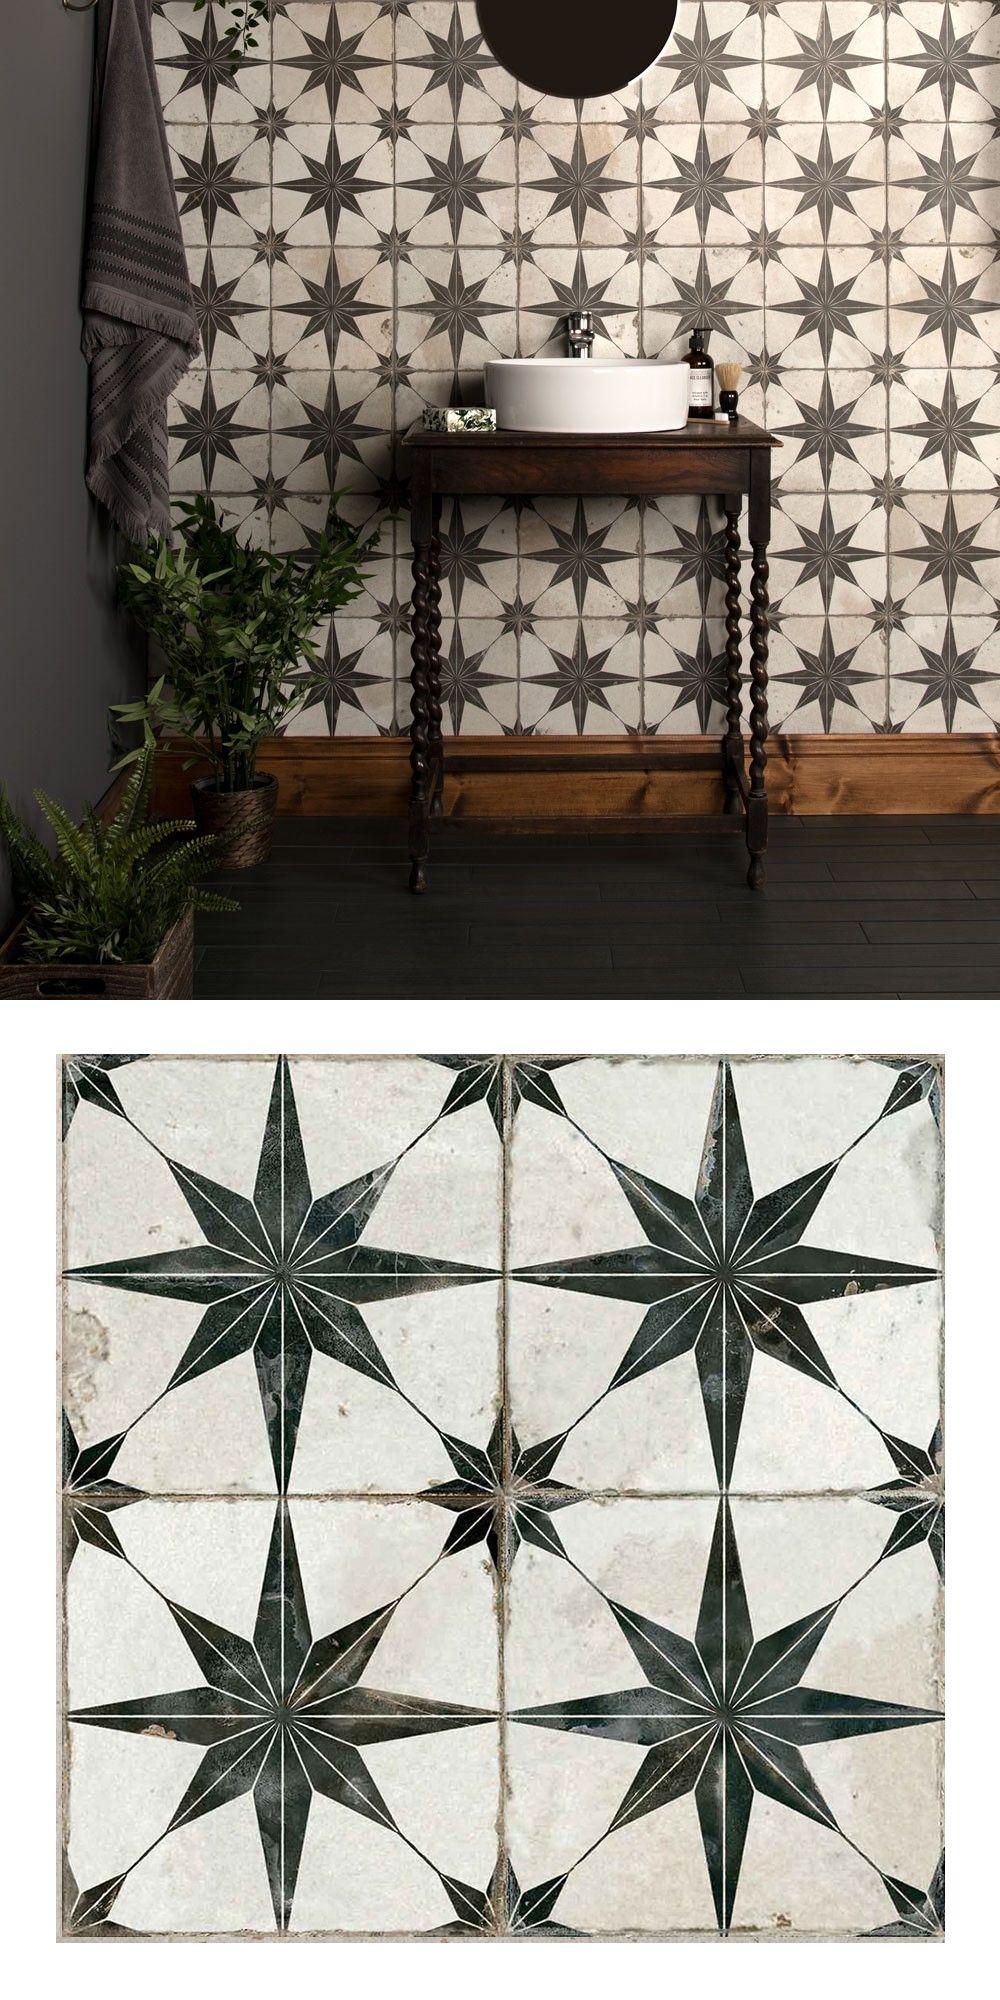 Photo of Scintilla Black Star Pattern Tiles